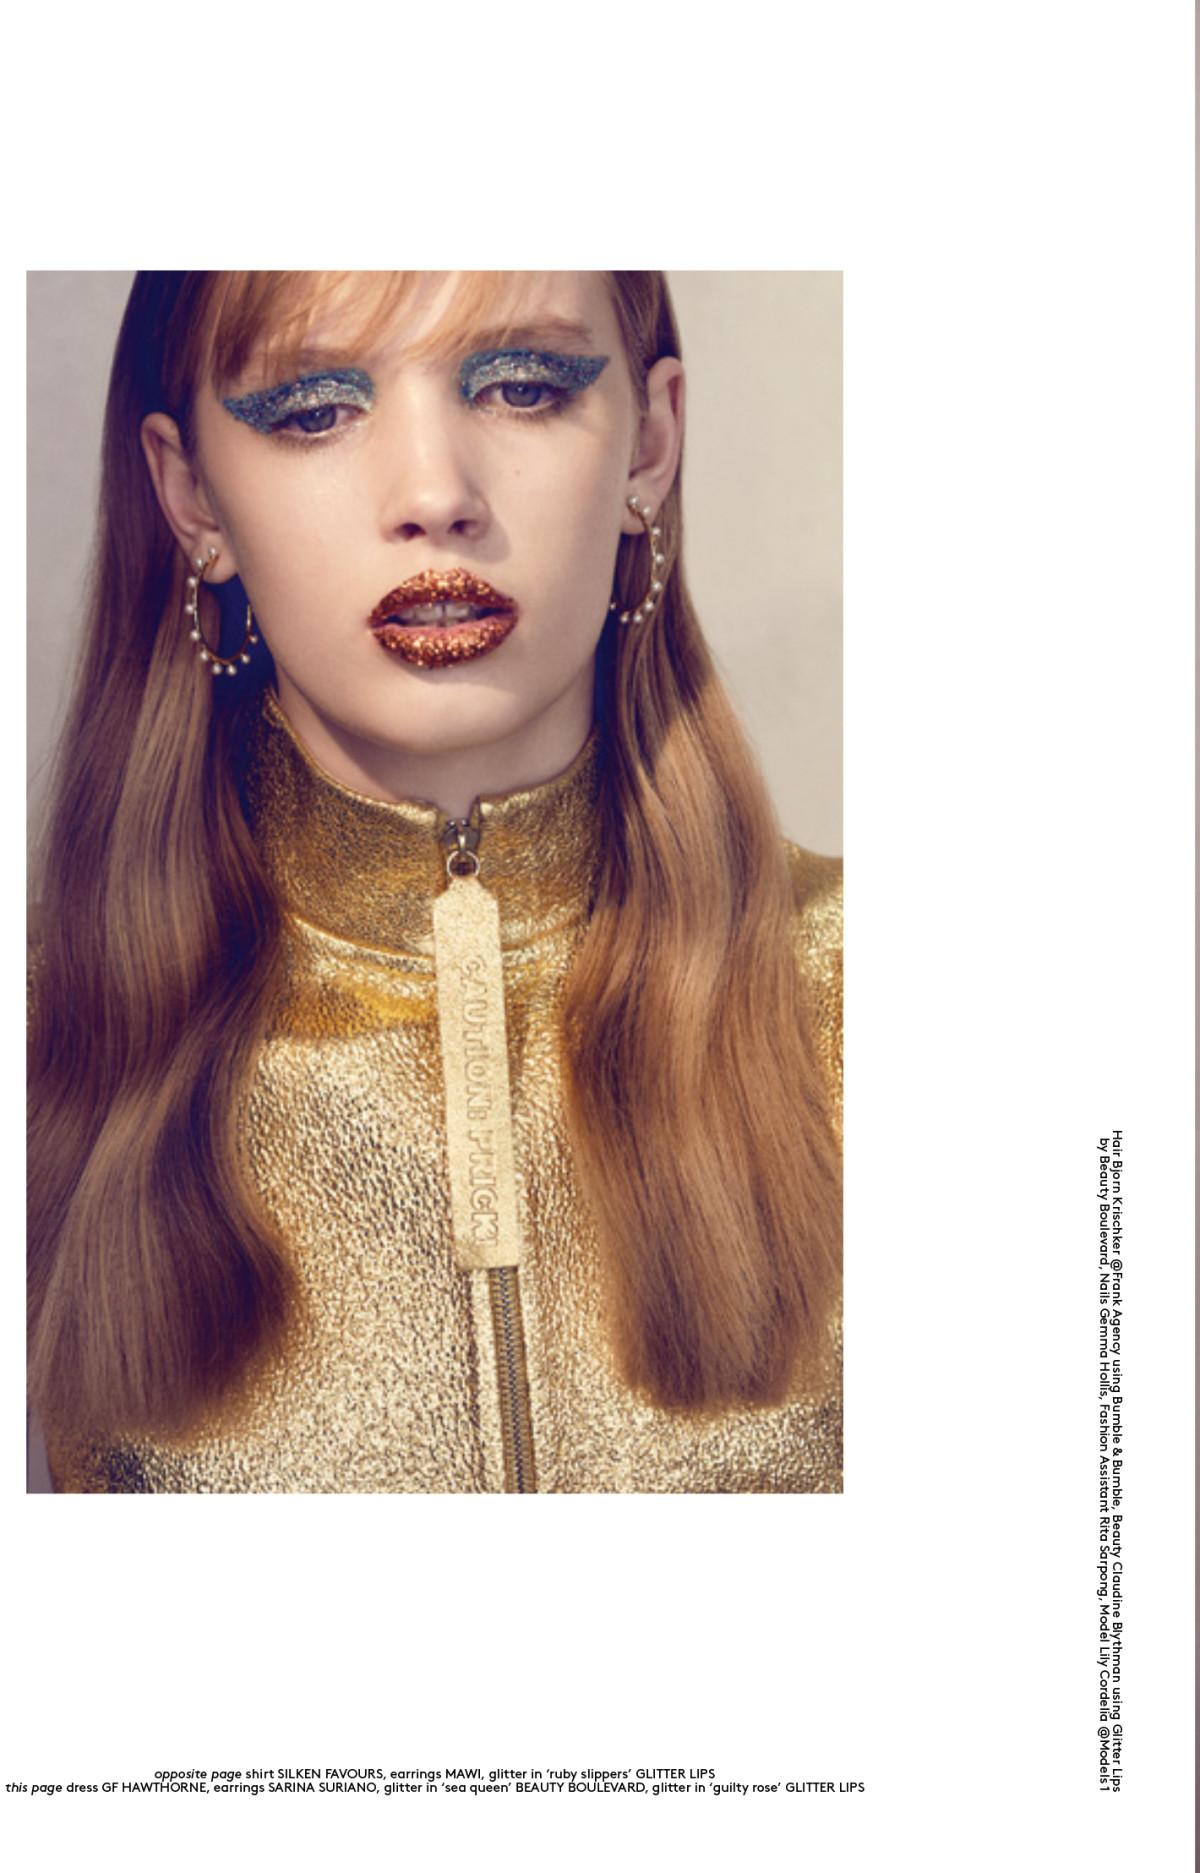 Glitter story, Claudine Blythman Makeup, Beauty story, glitter eyes, glitter lips, festival glitter, notion by Philip Blythman, Rhona ezuma, lily garret , Bjorn krischker, Glitter lips by beauty boulevard